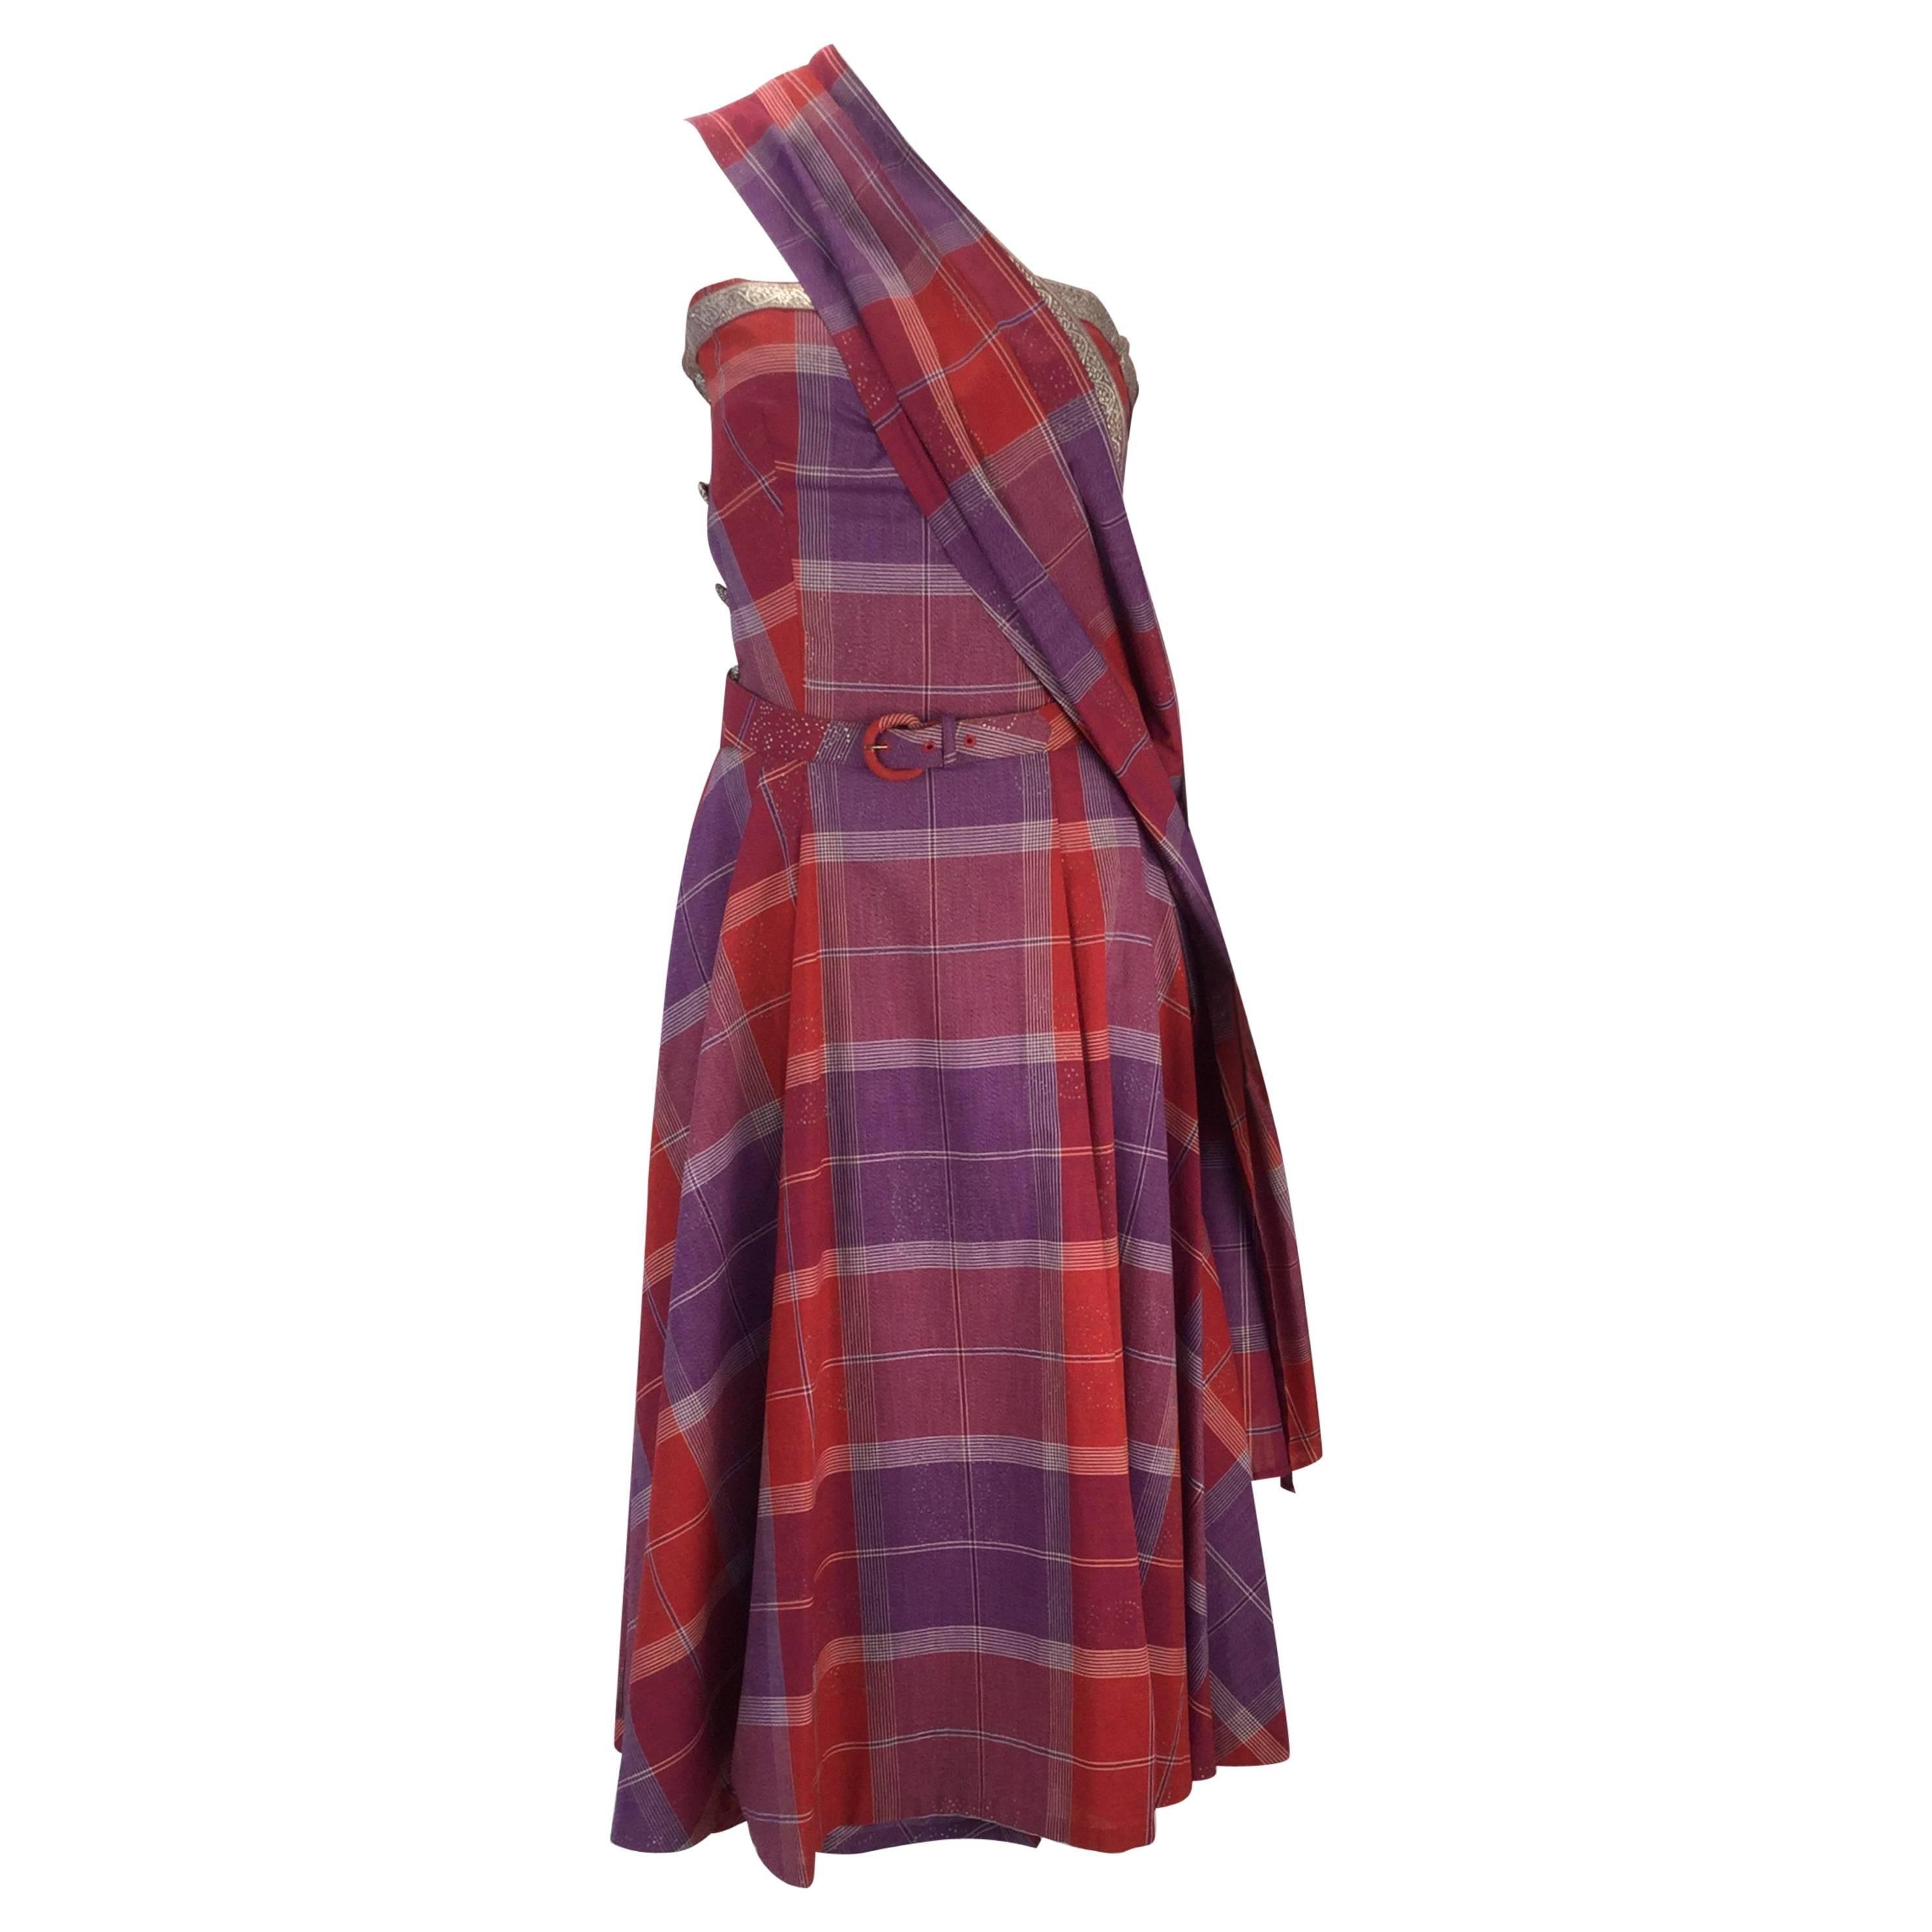 1940s Tina Leser Cotton Madras Dress With Sash